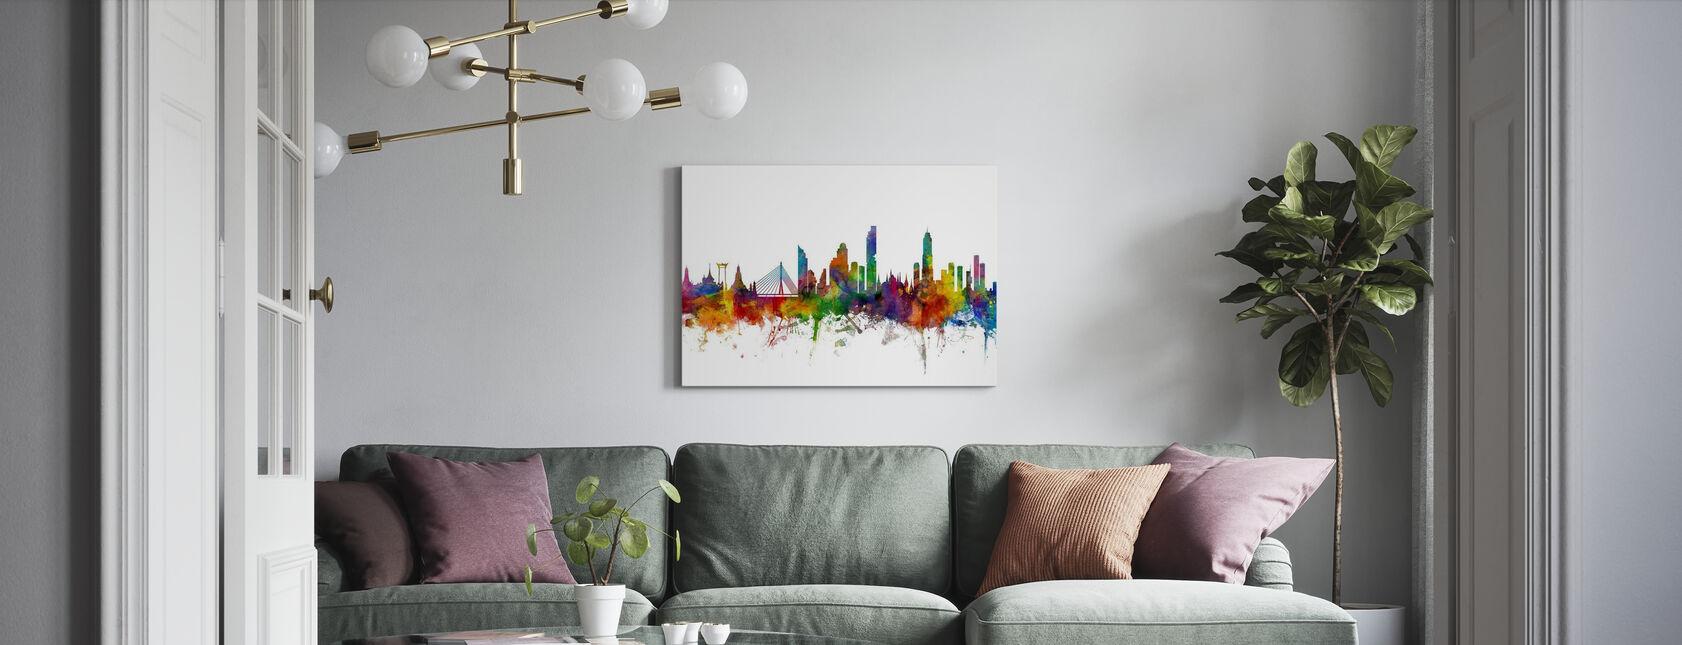 Bangkok Skyline - Leinwandbild - Wohnzimmer